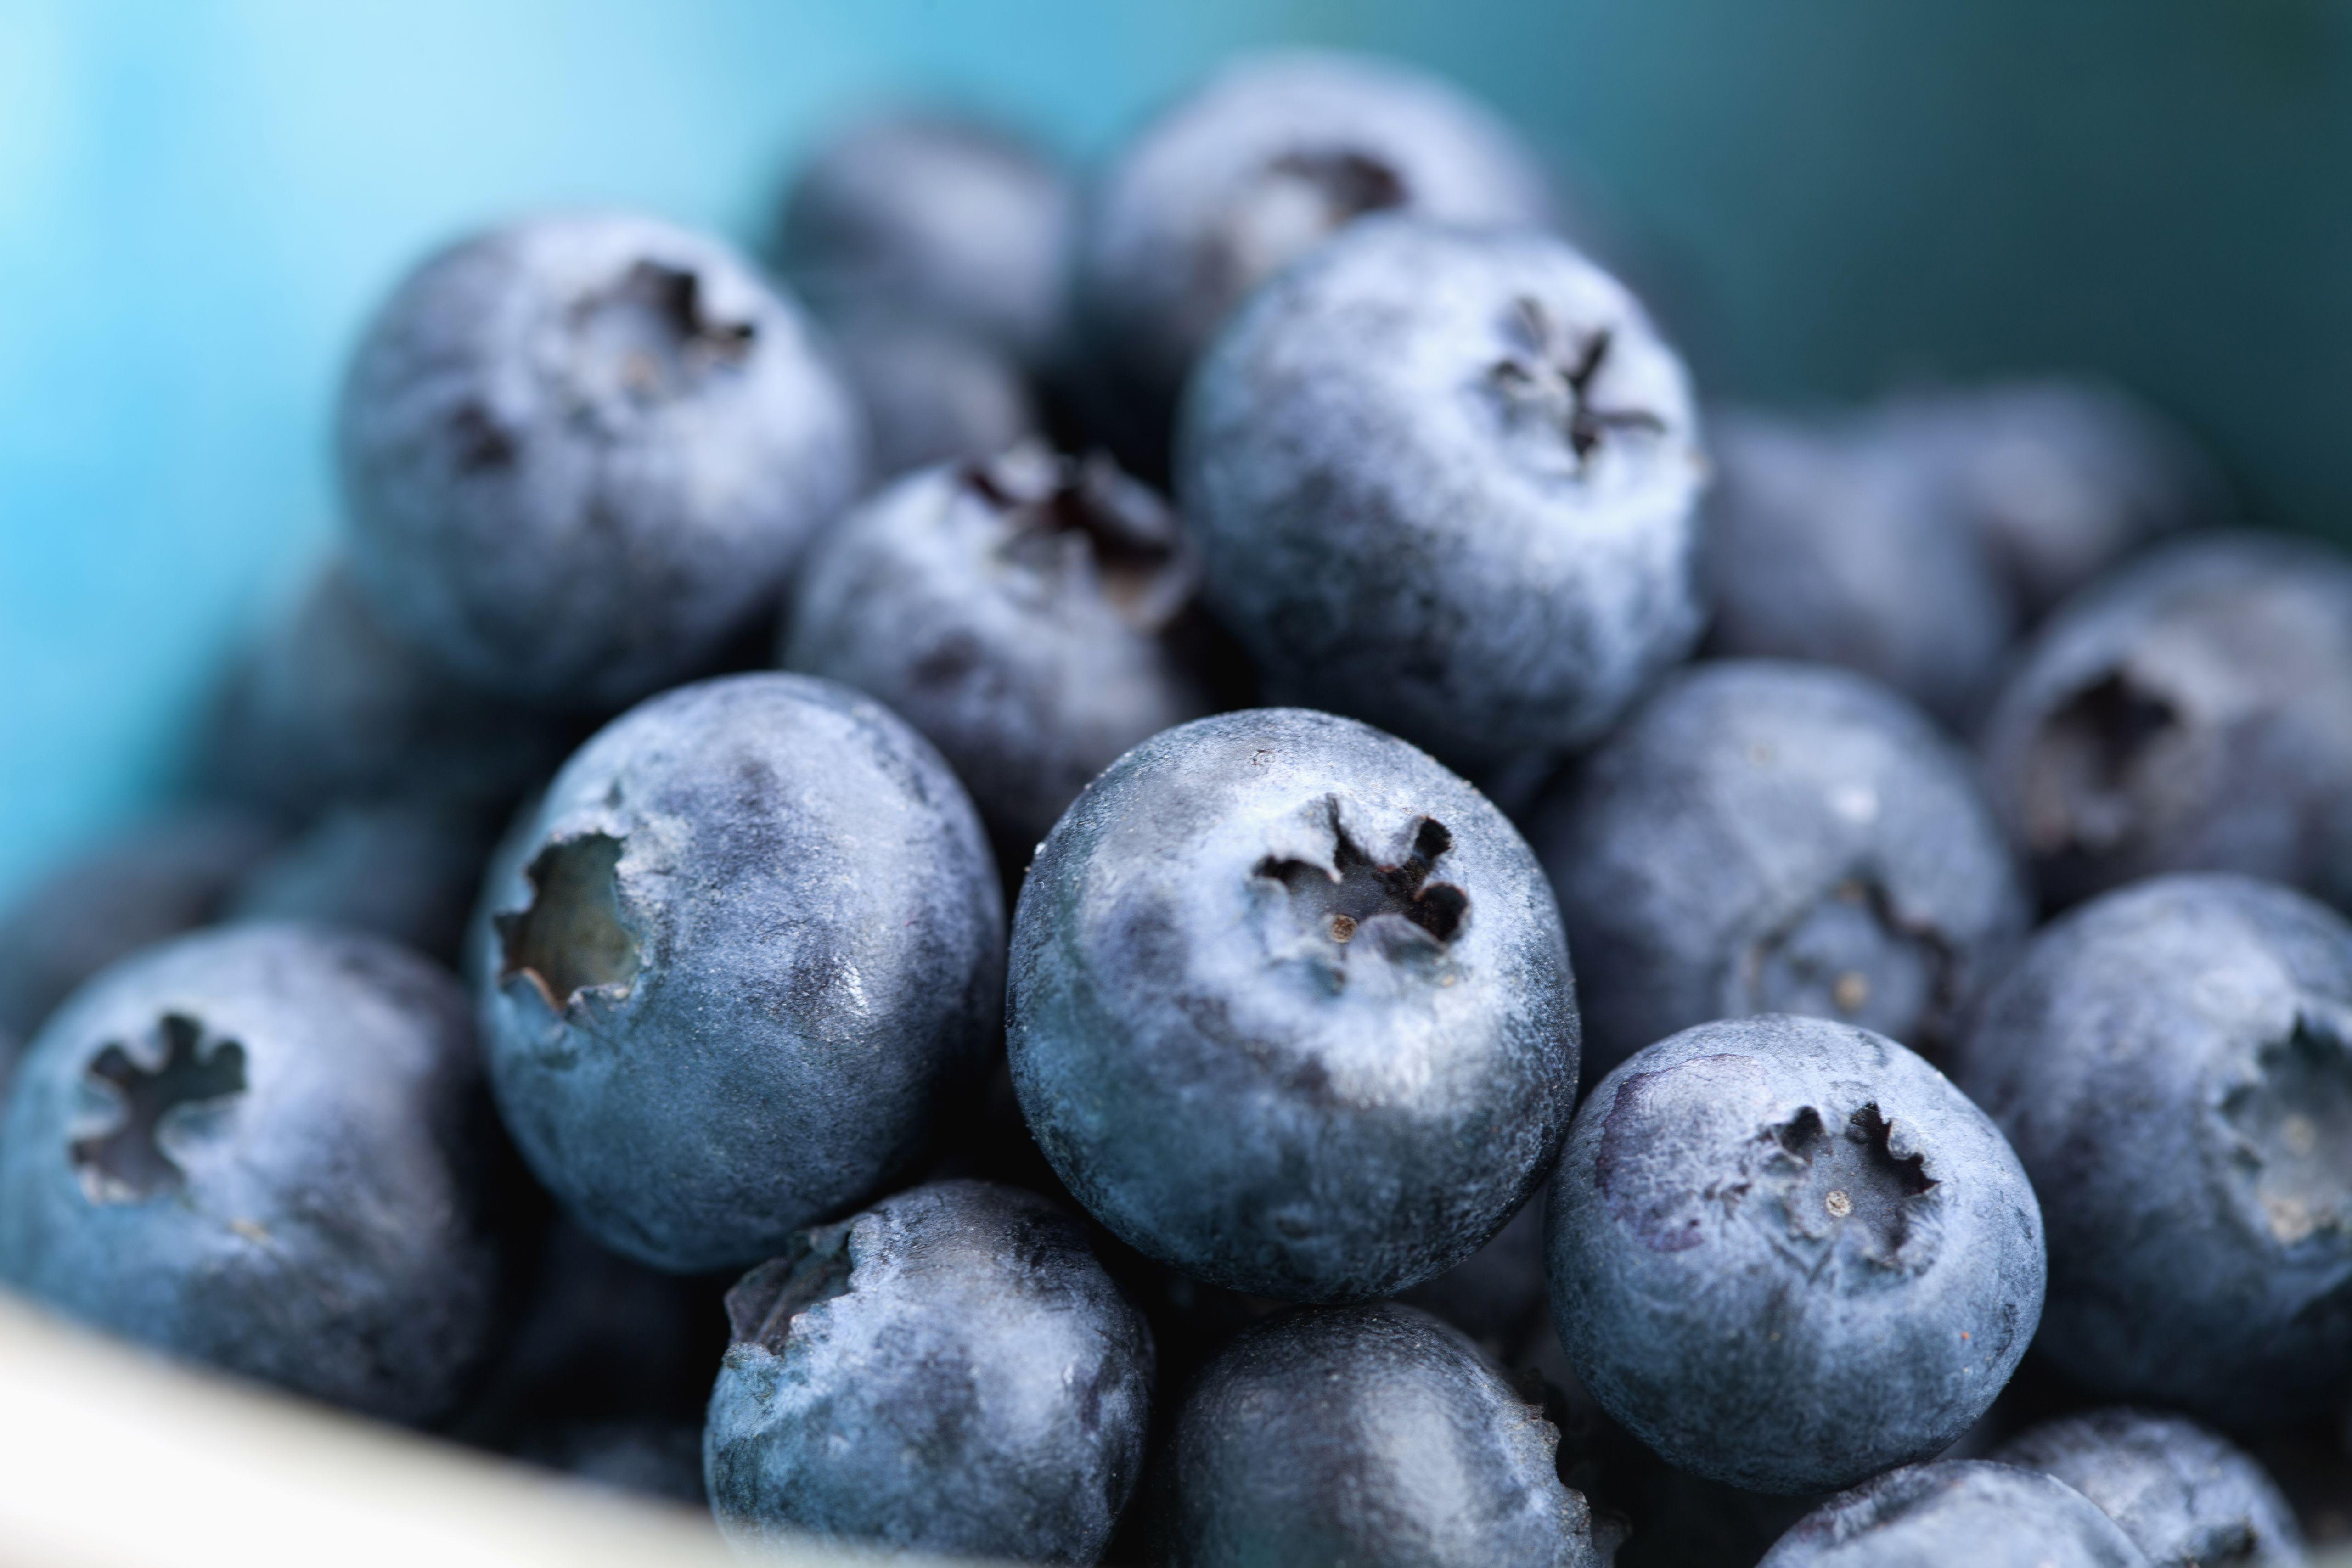 Studio Shot of blueberries